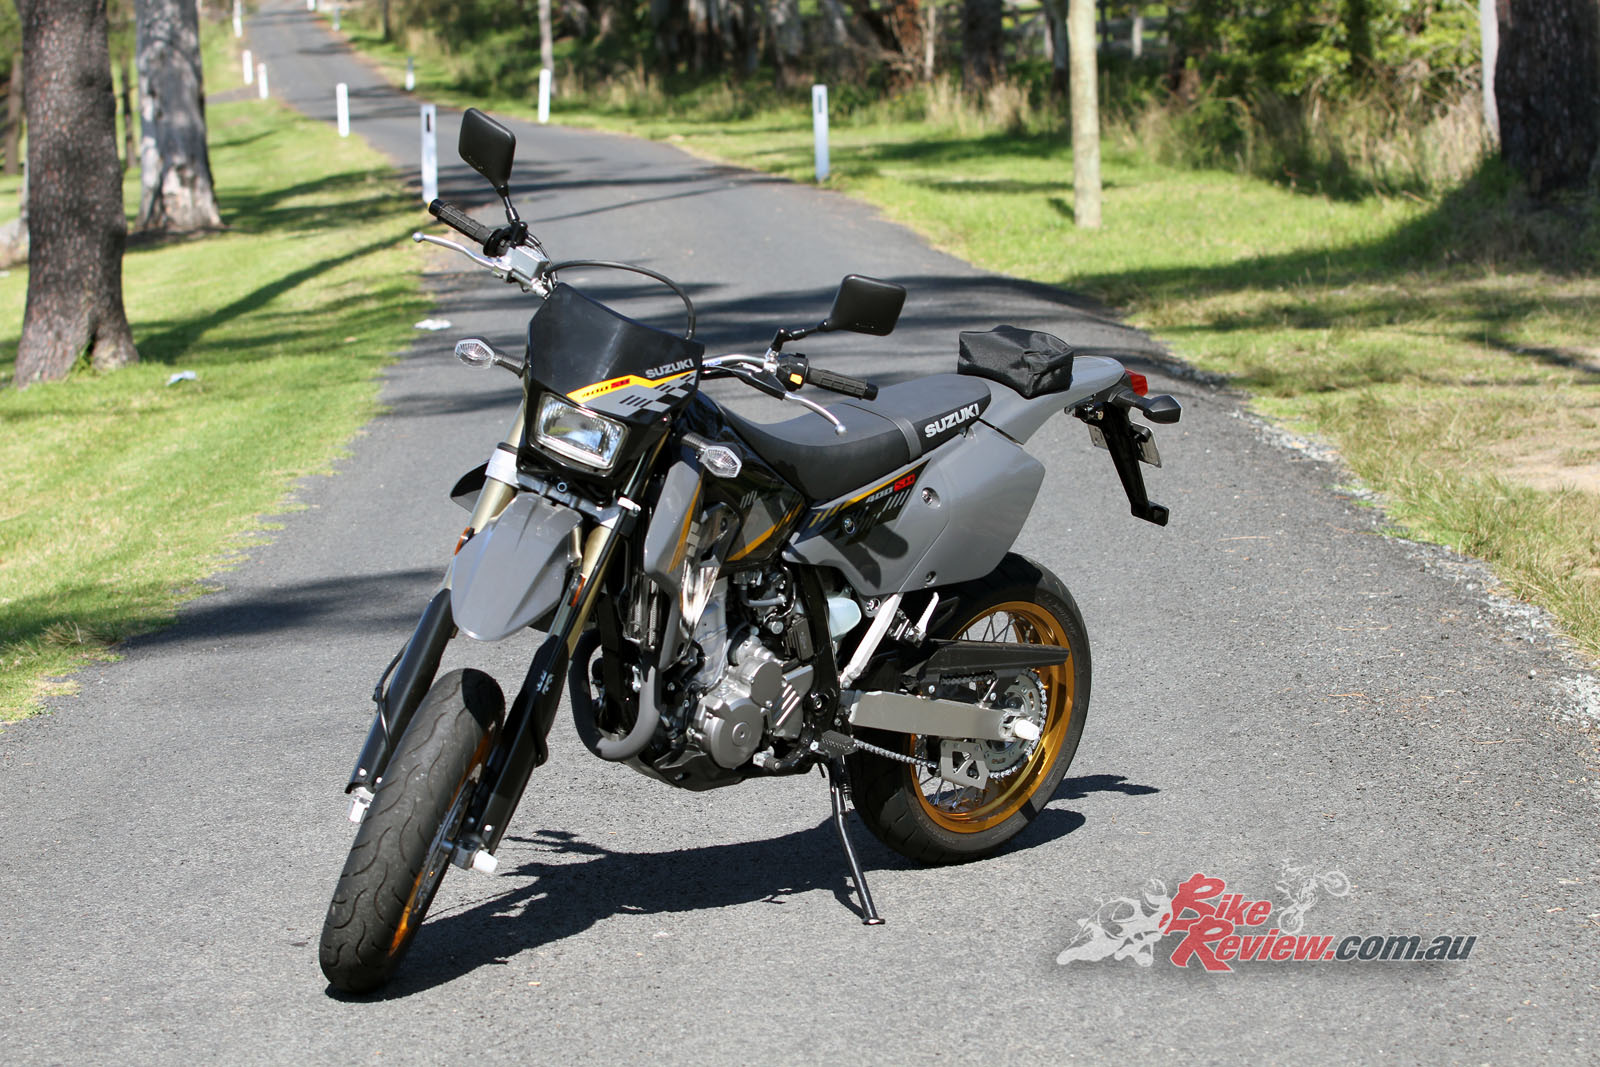 Review: 2017 Suzuki DR-Z400SM - Bike Review